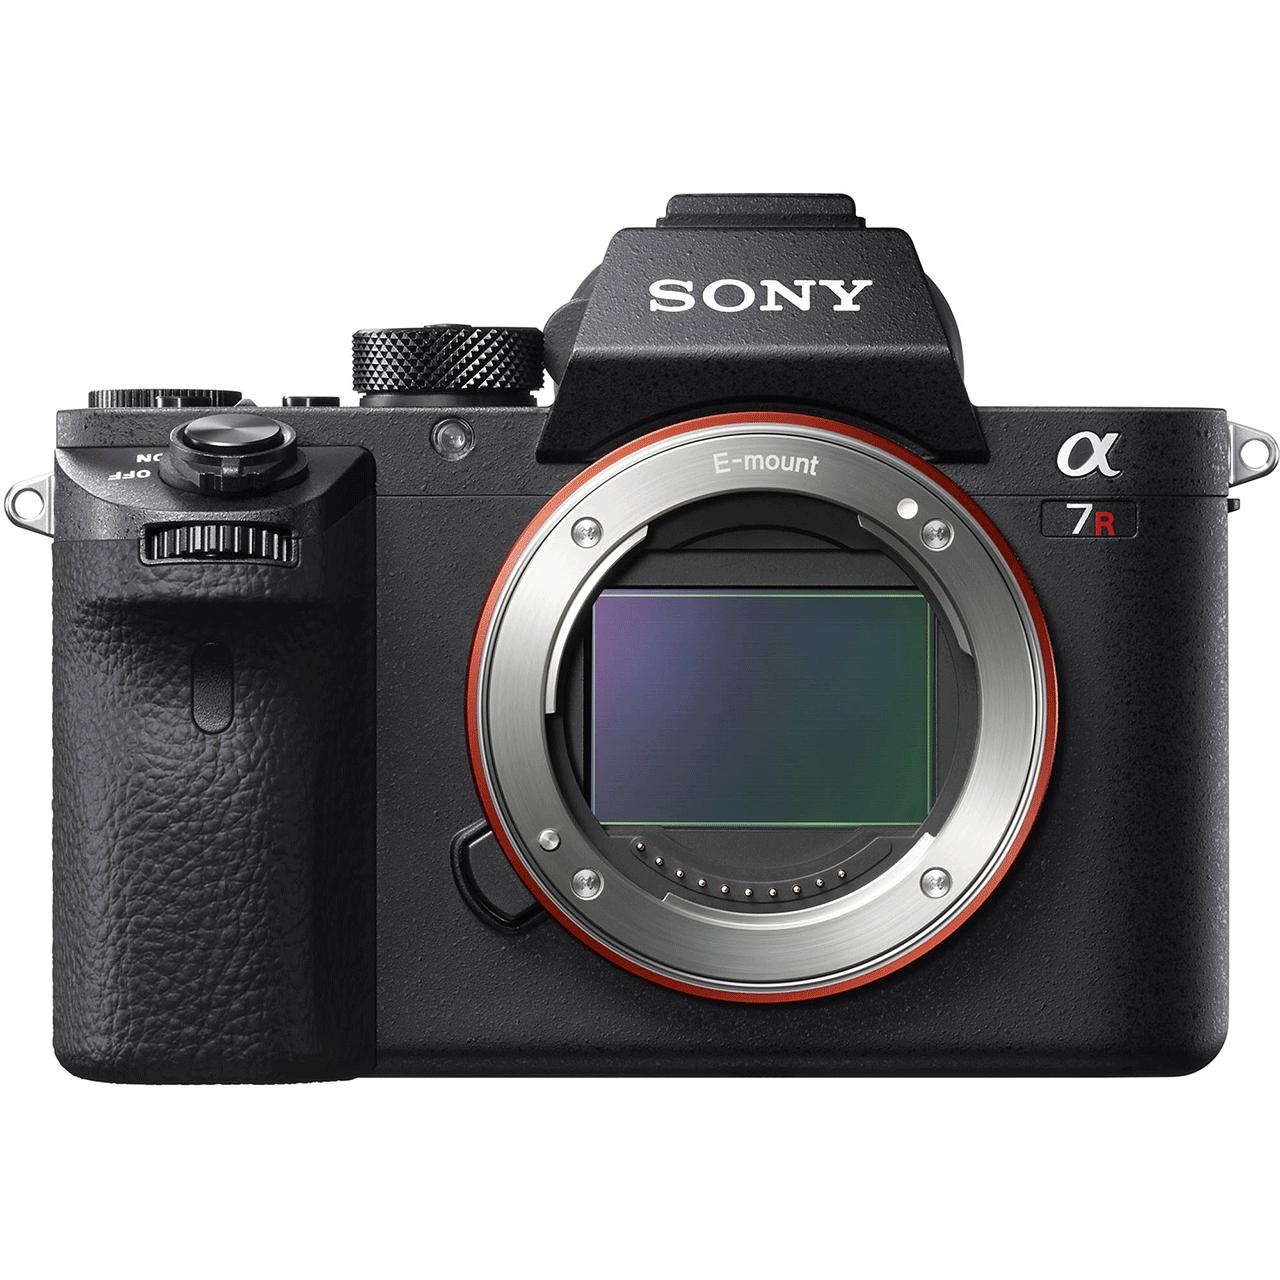 دوربین دیجیتال بدون آینه سونی مدل Sony A7R II Mirrorless Digital Camera Body Only